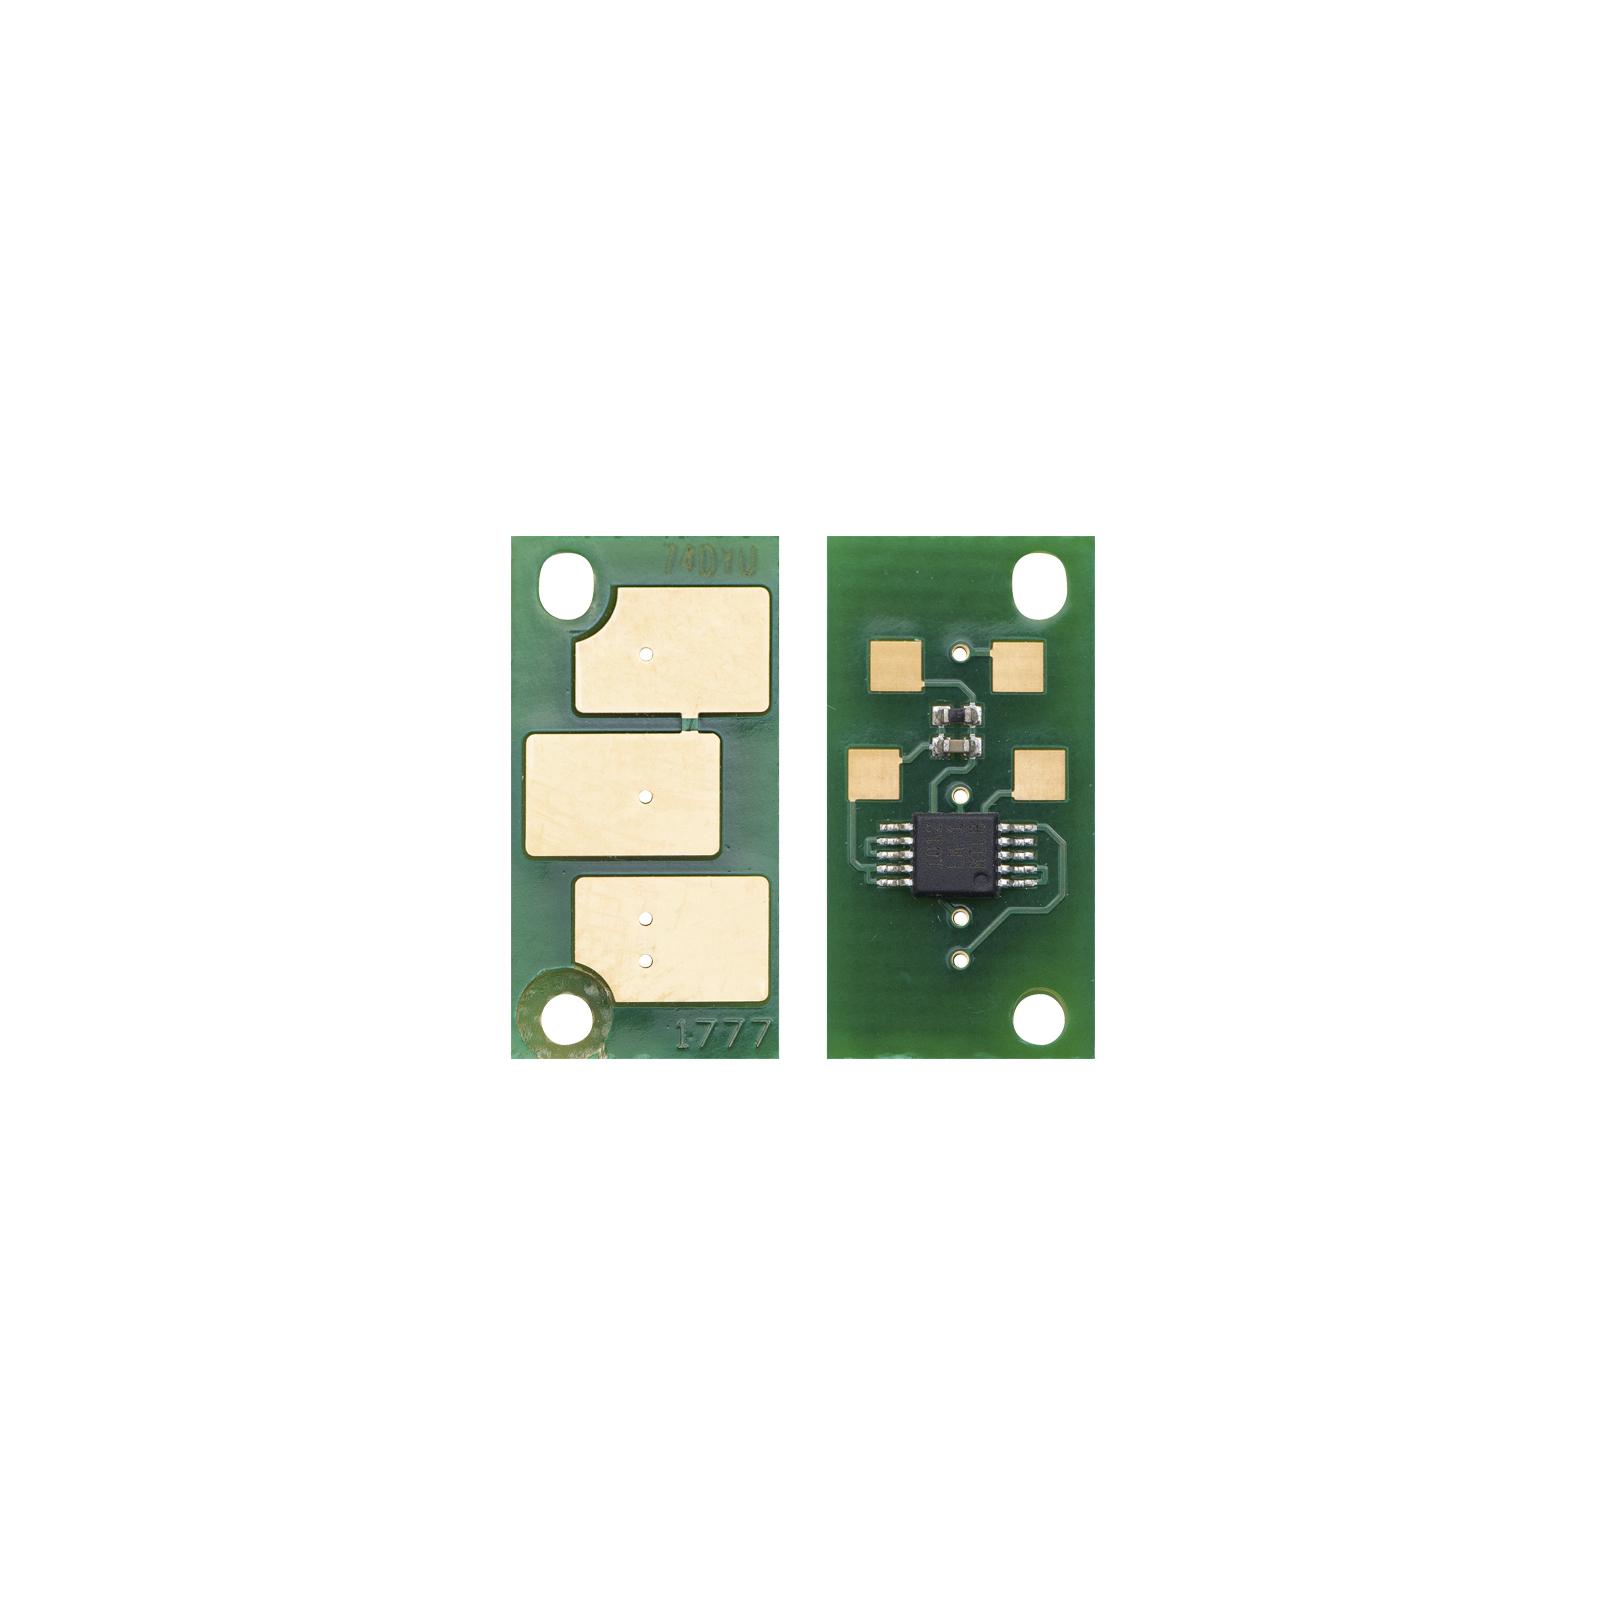 Чип для картриджа Konica Minolta 7450 30k yellow Static Control (KM7450DUCP-YEU)